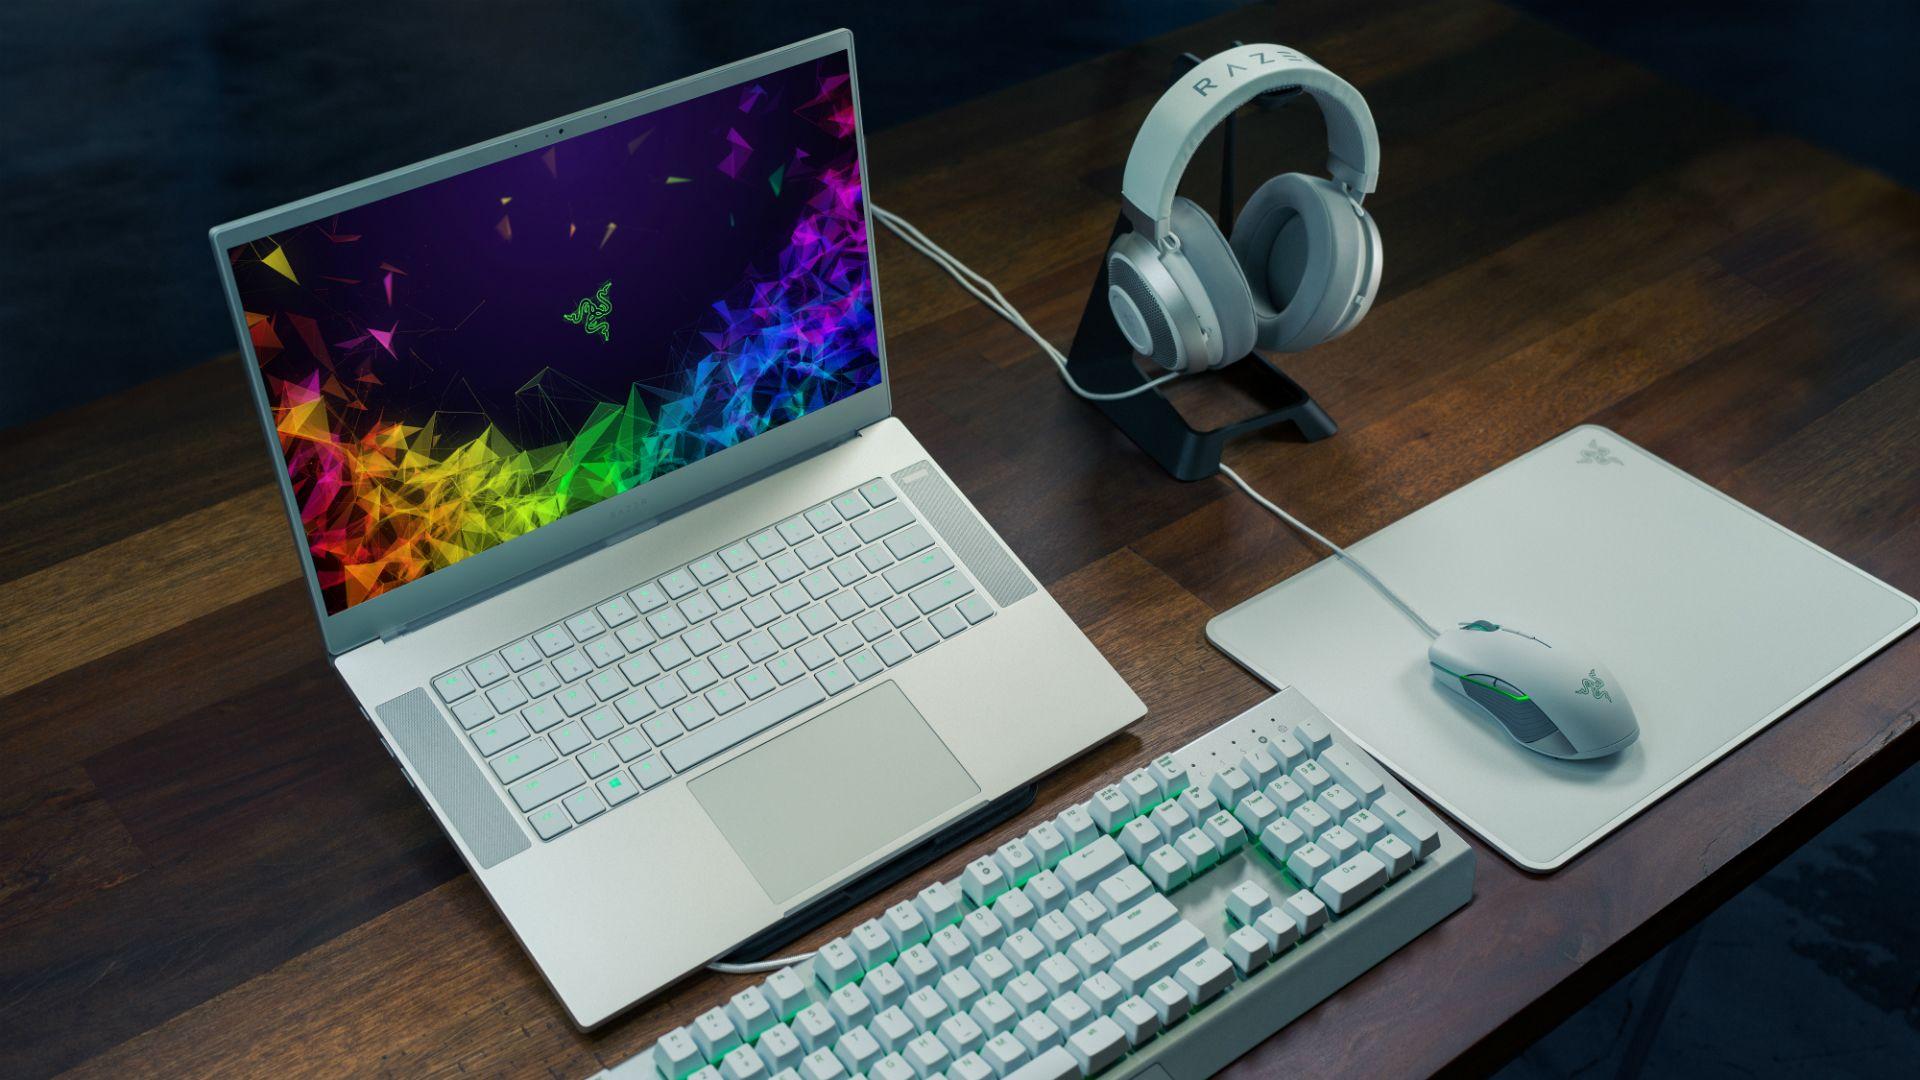 New, cheaper Razer Blade gaming laptop packs dual storage